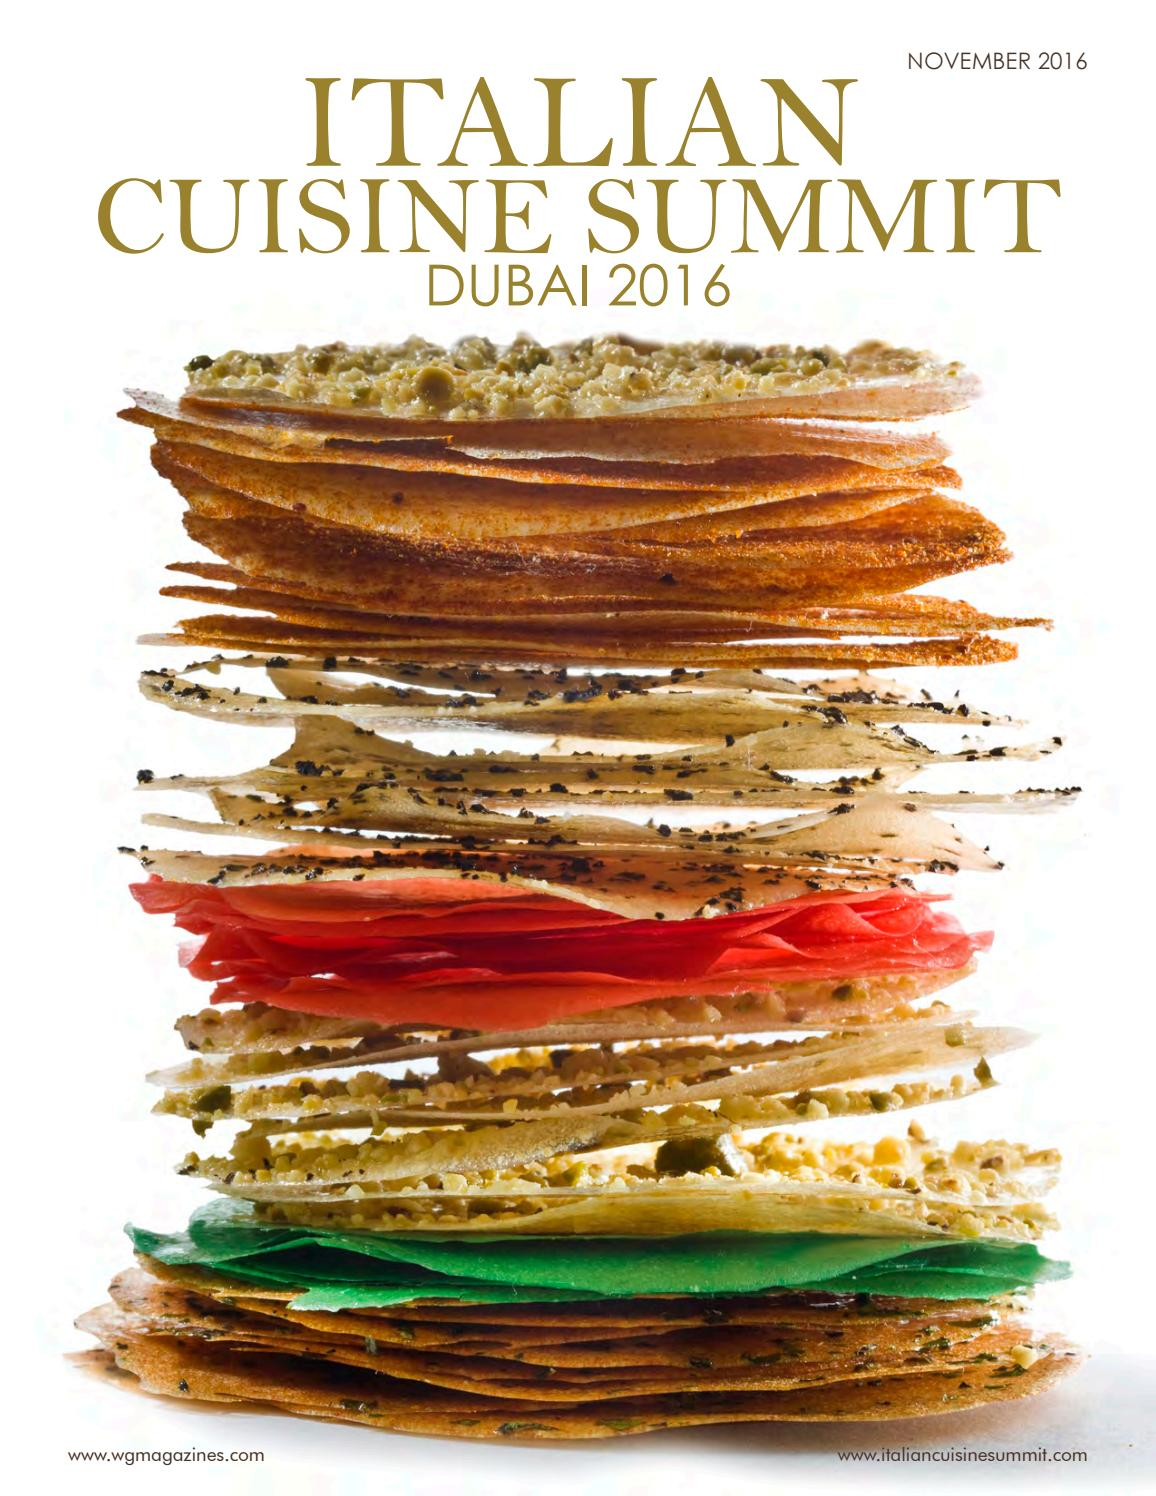 Wg Italian Cuisine Summit 2016 By Wg Magazines Issuu